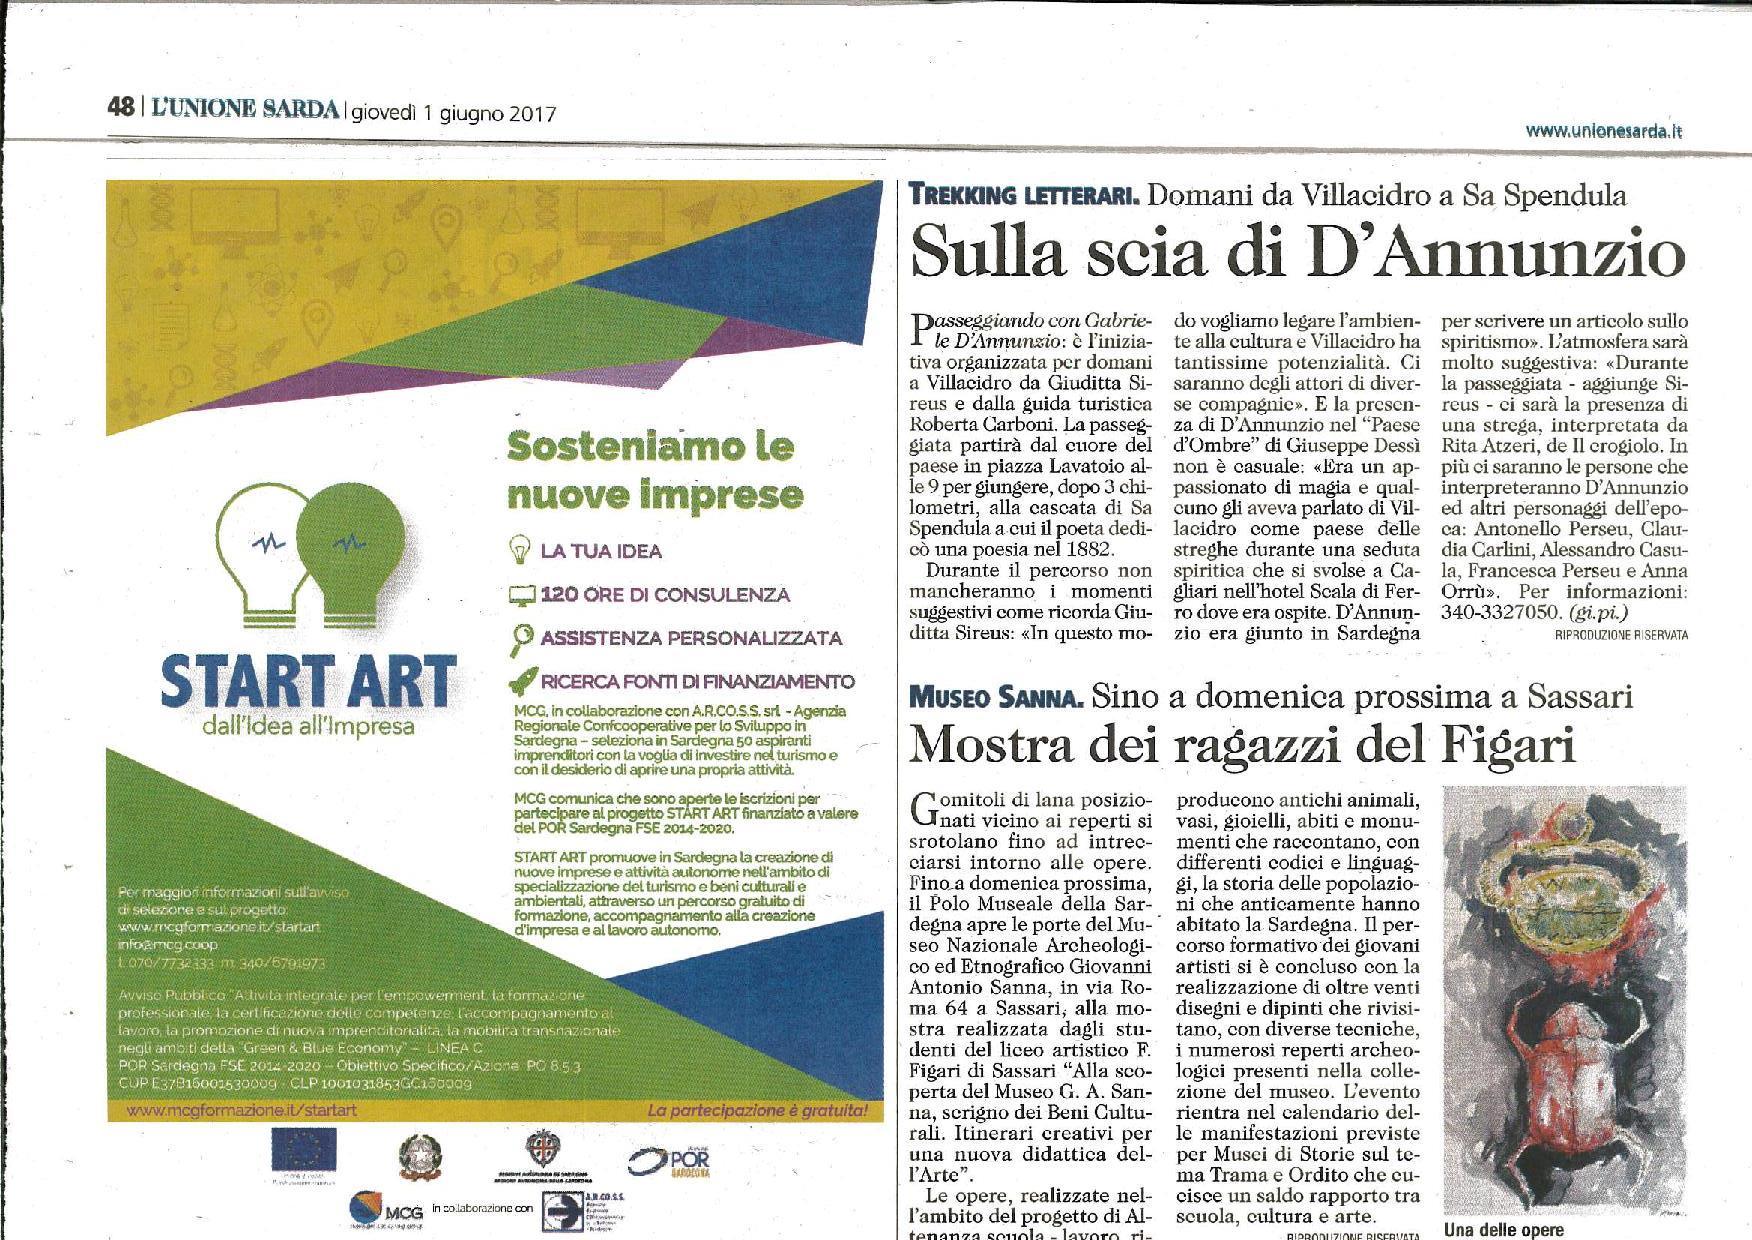 START ART- UNIONE SARDA.1.6.2017